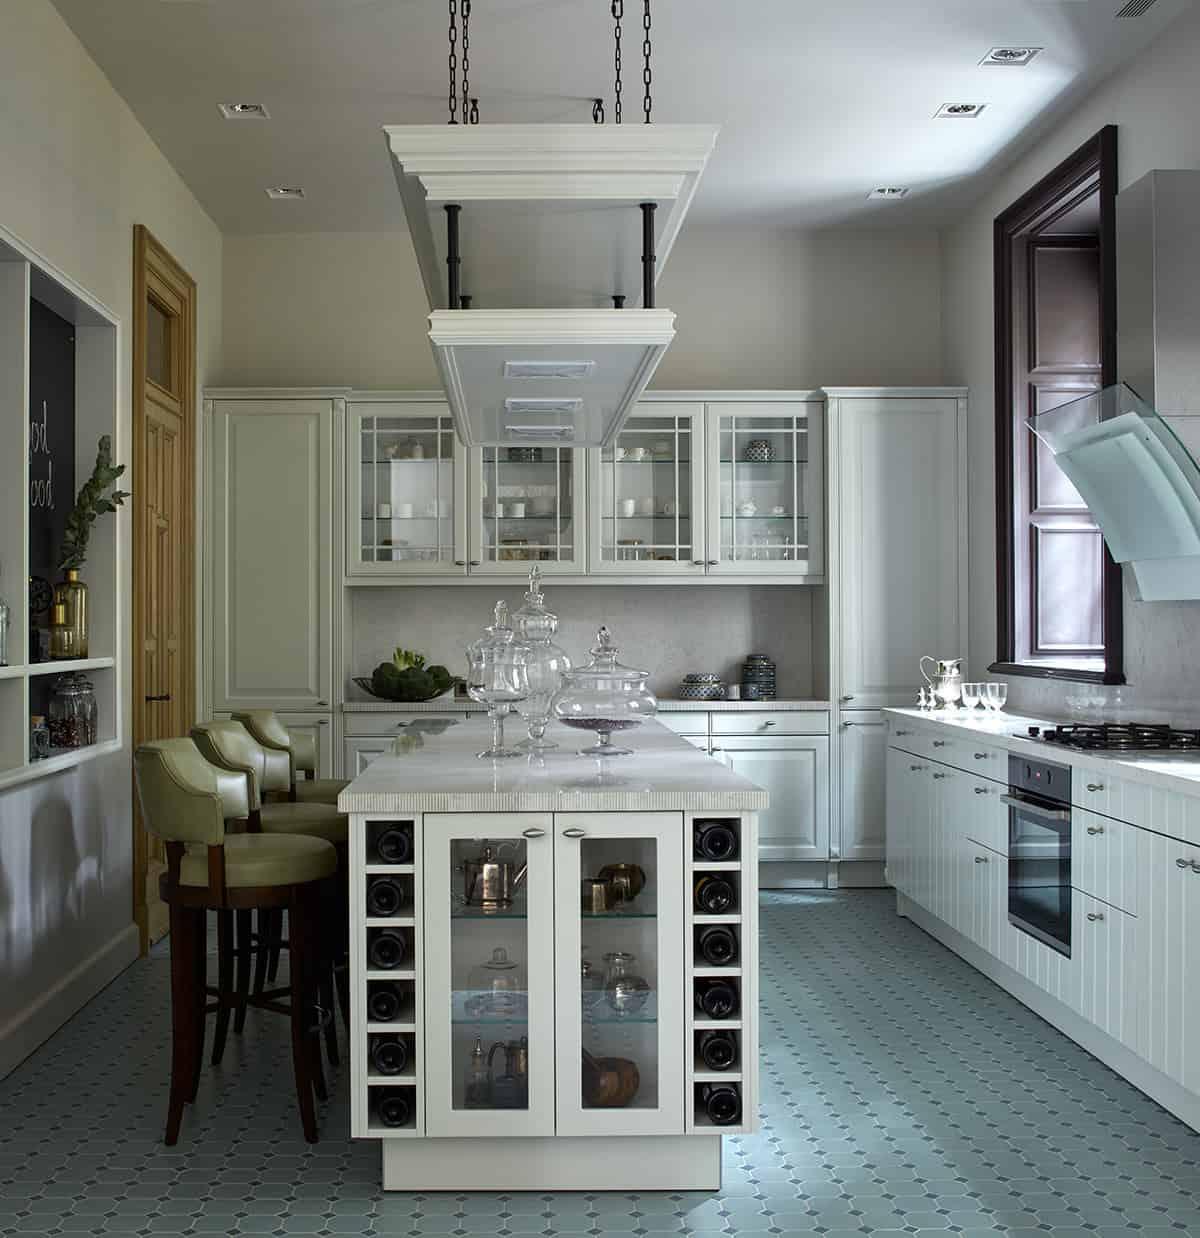 Kitchen Remodel 101 Stunning Ideas For Your Kitchen Design: 101 Custom Kitchen Design Ideas (2019 Pictures